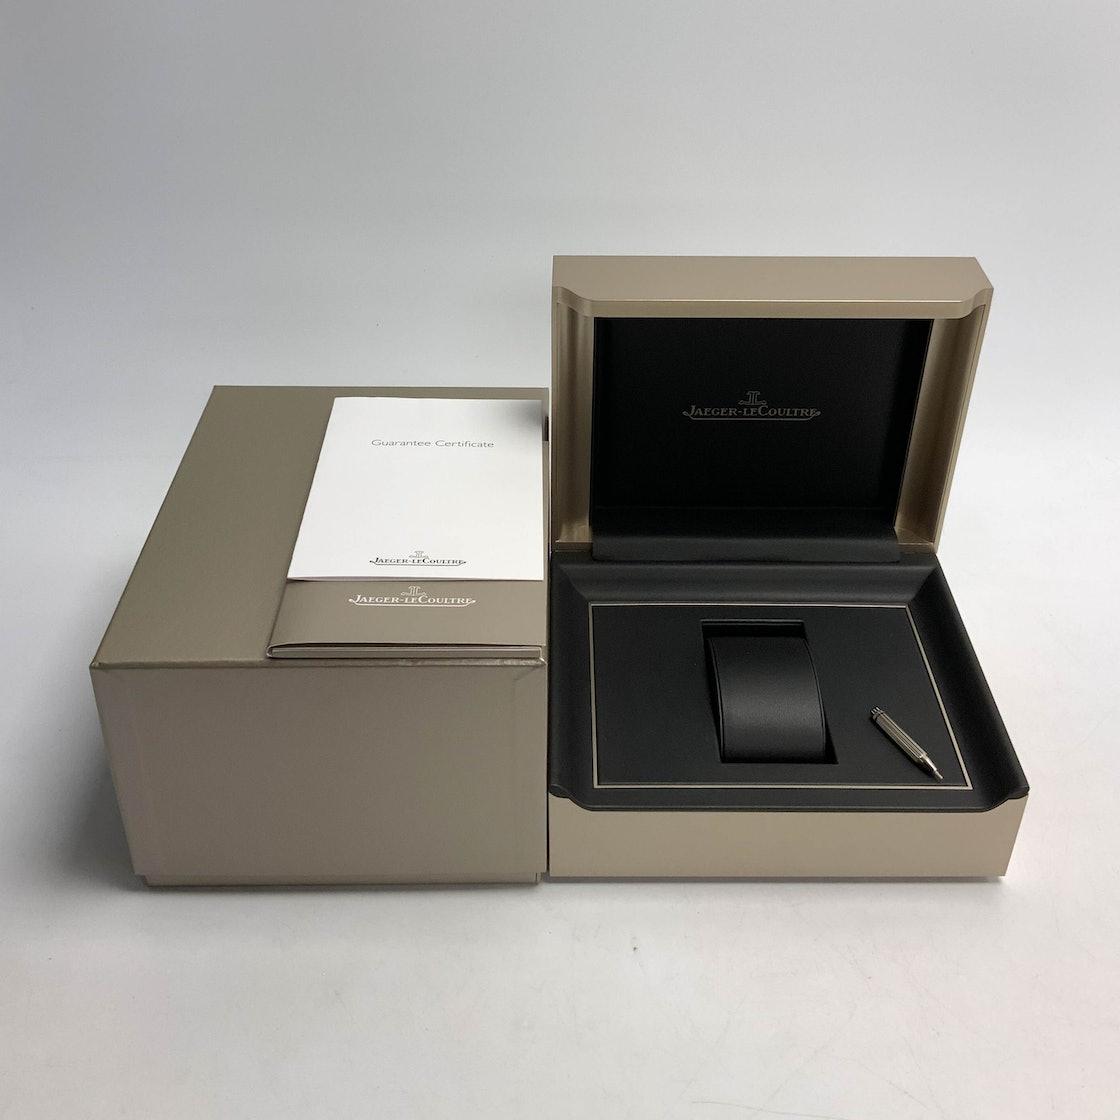 Jaeger-LeCoultre Duometre a Chronographe Q6016490